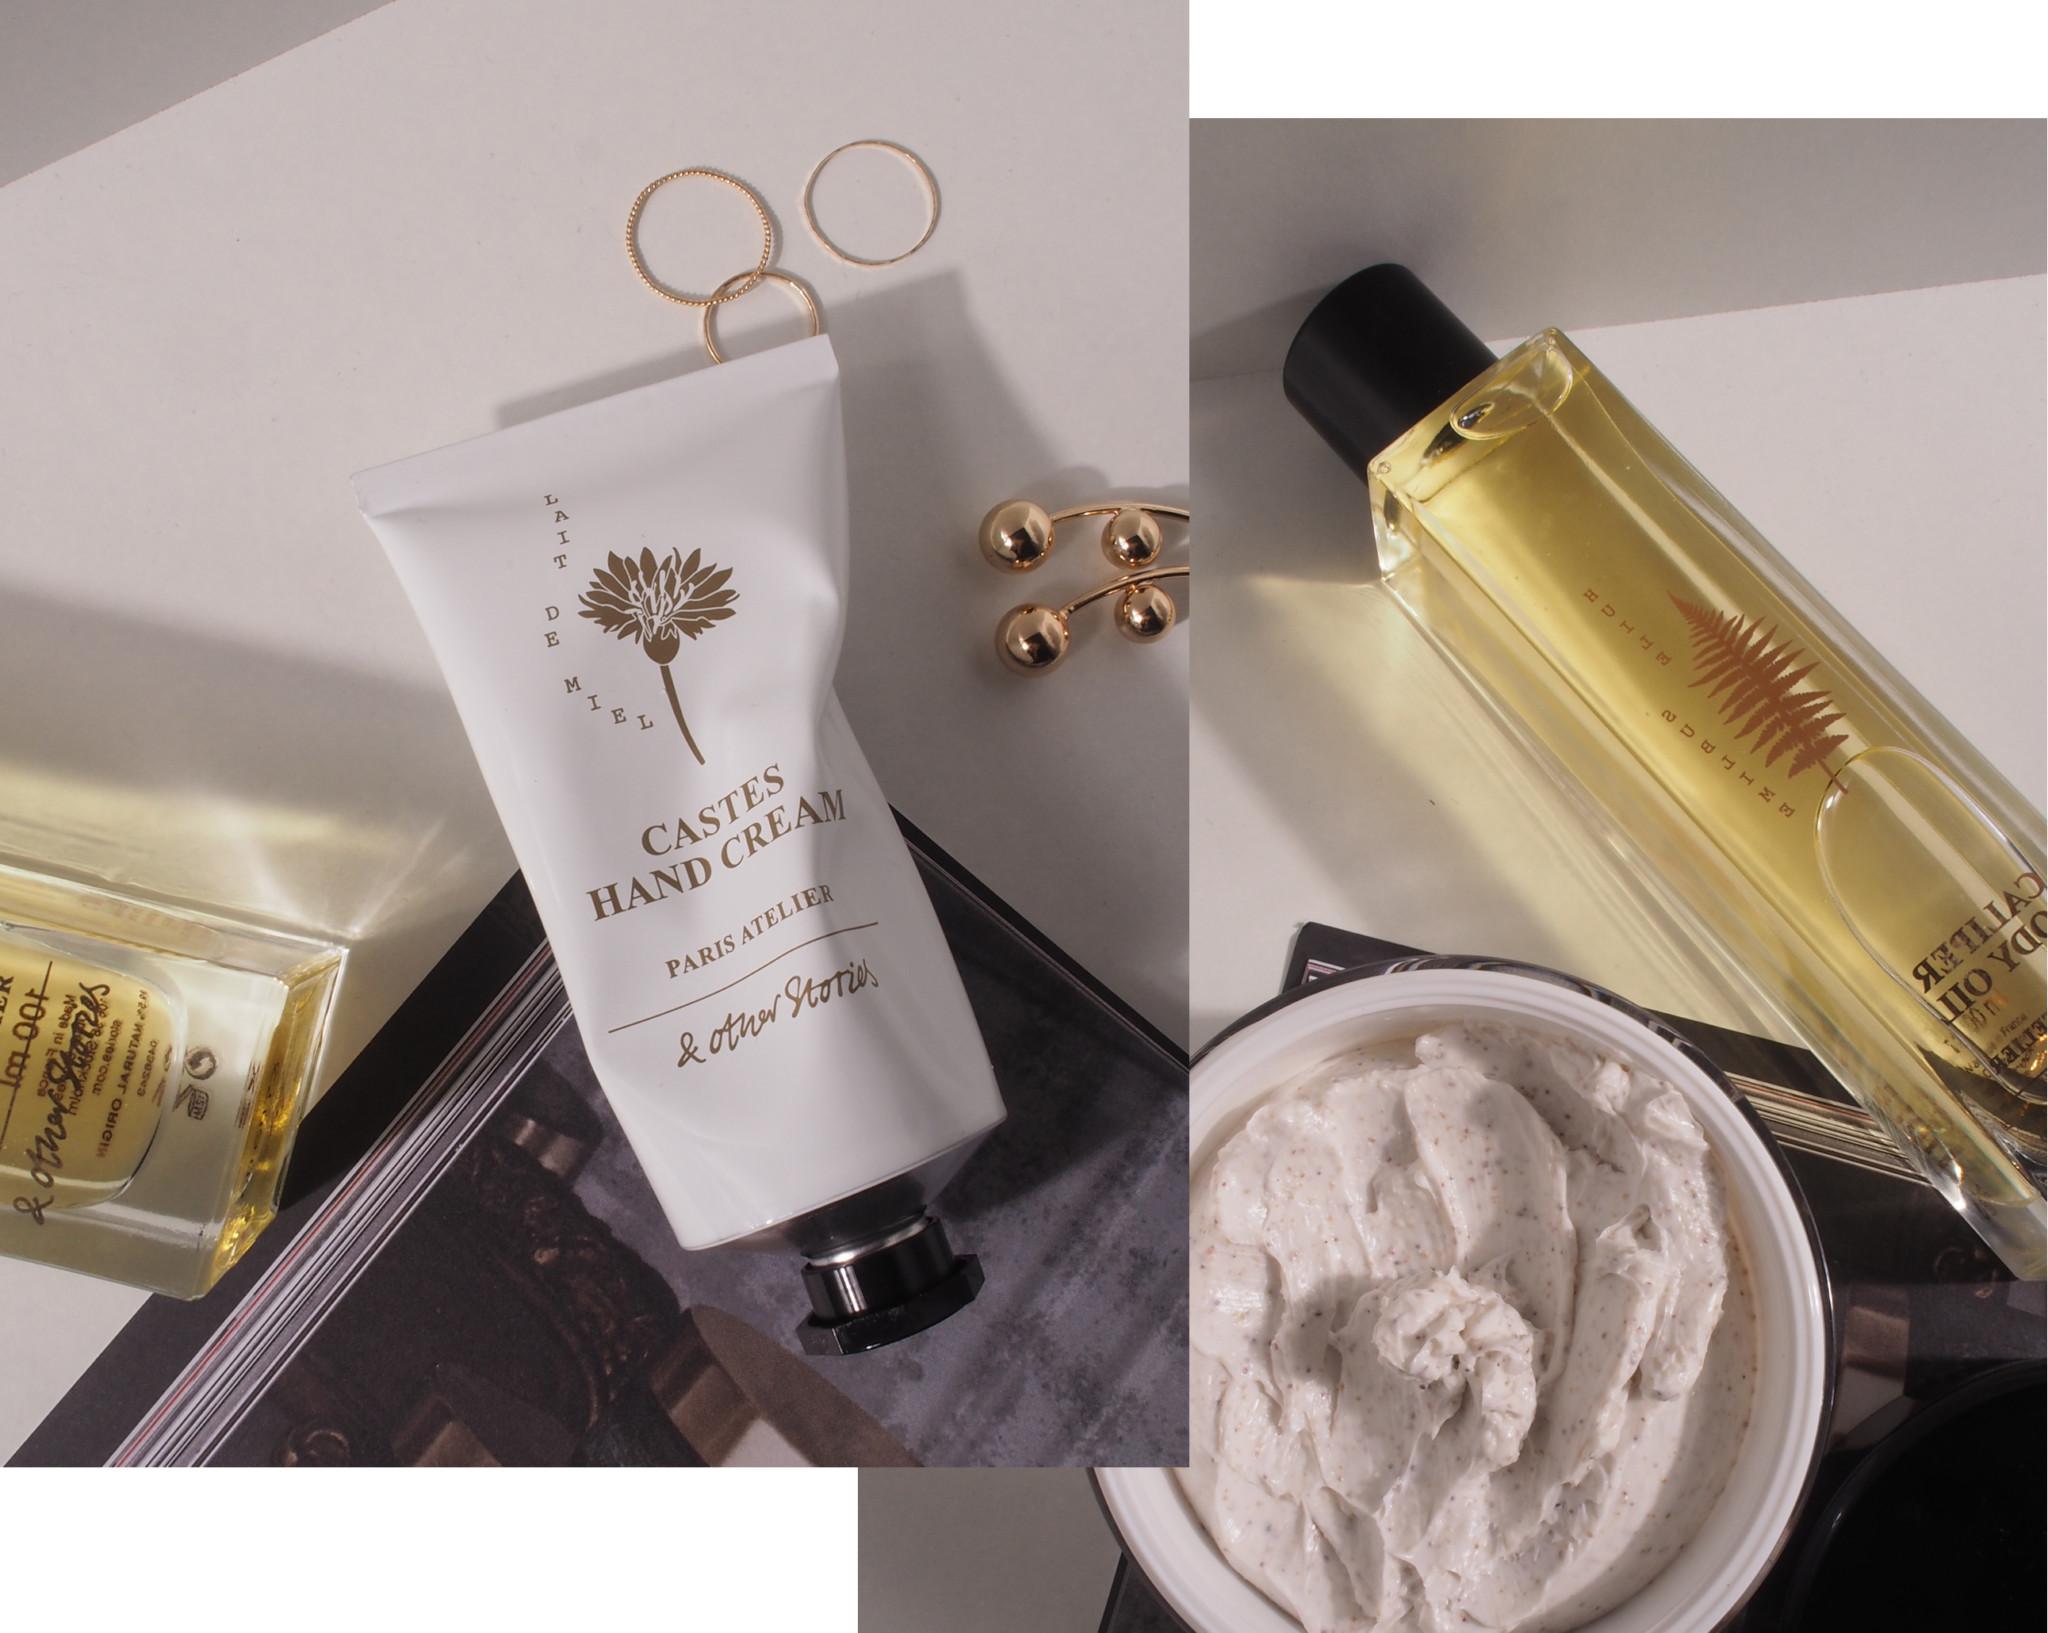 Beautyblog-Beauty-Blog-bare minds-Elina Neumann-& Other Stories Paris Atelier Beauty 3